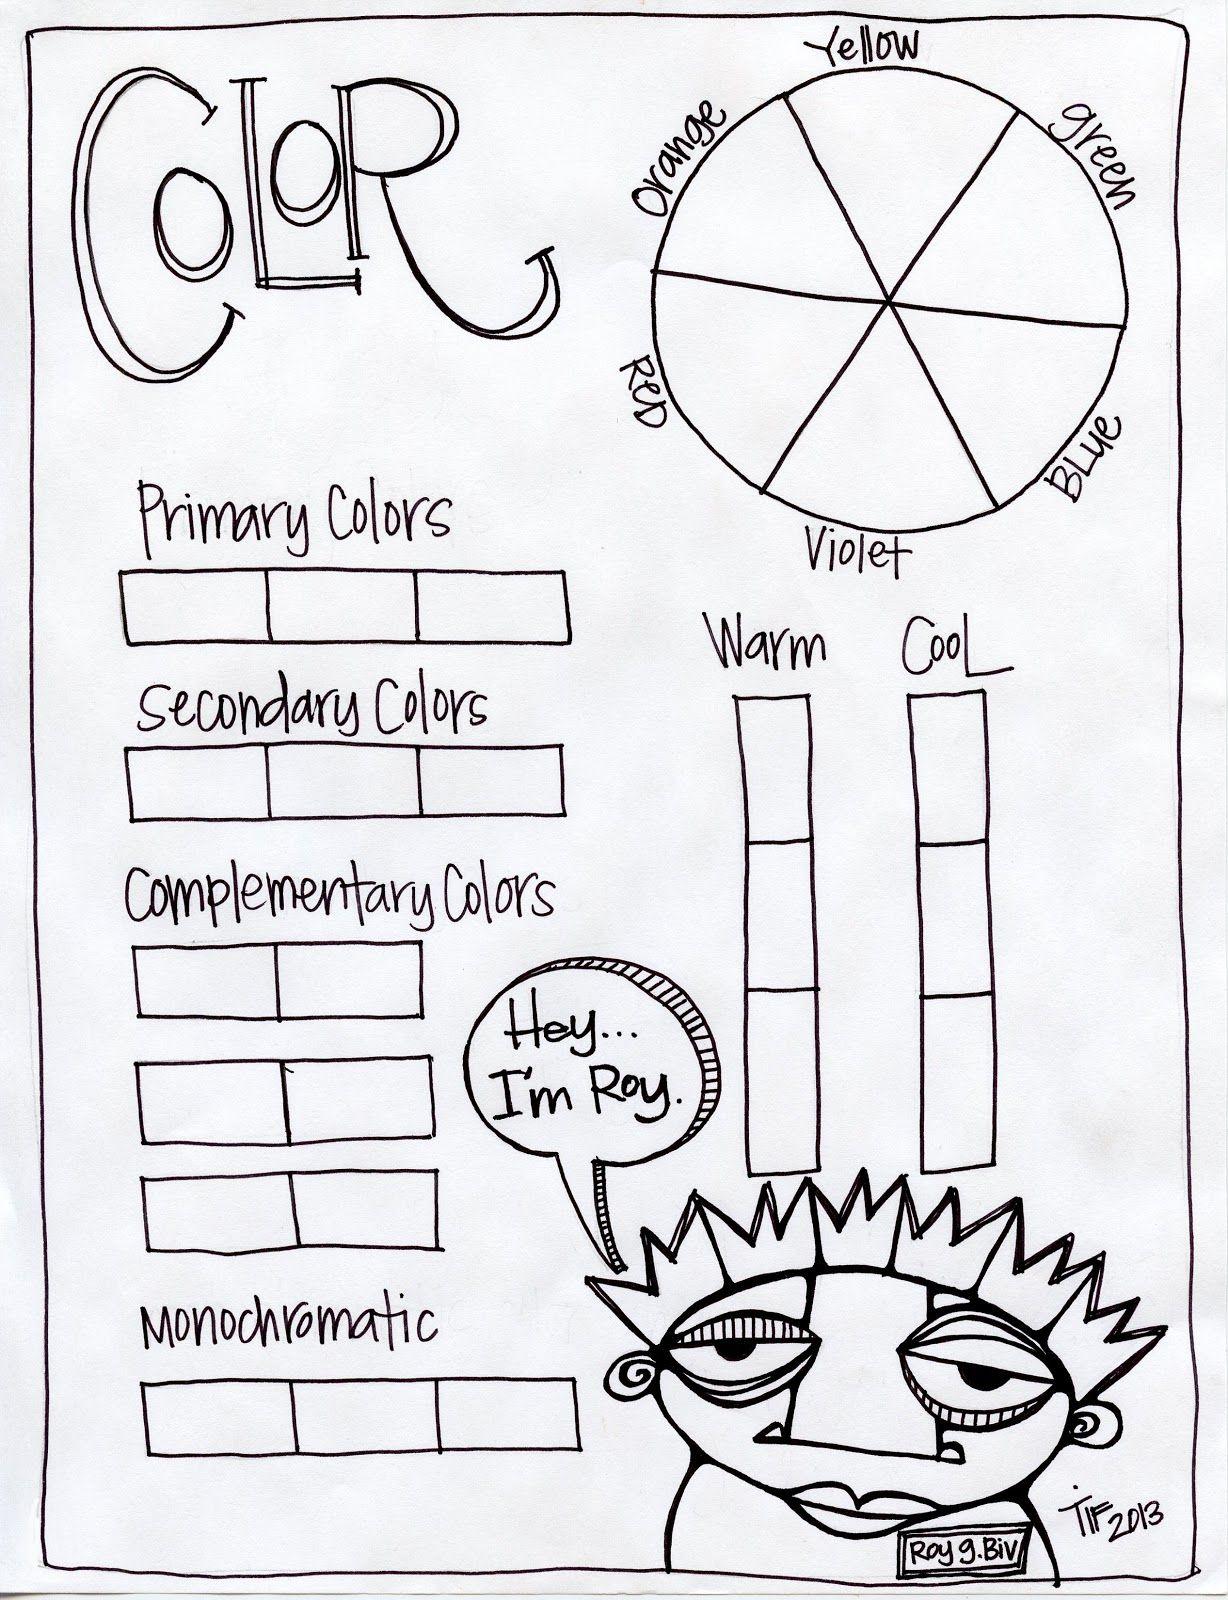 medium resolution of Pin by Jennifer Barciszewski on Elementary Art: Critique and Assessment    Art lessons elementary